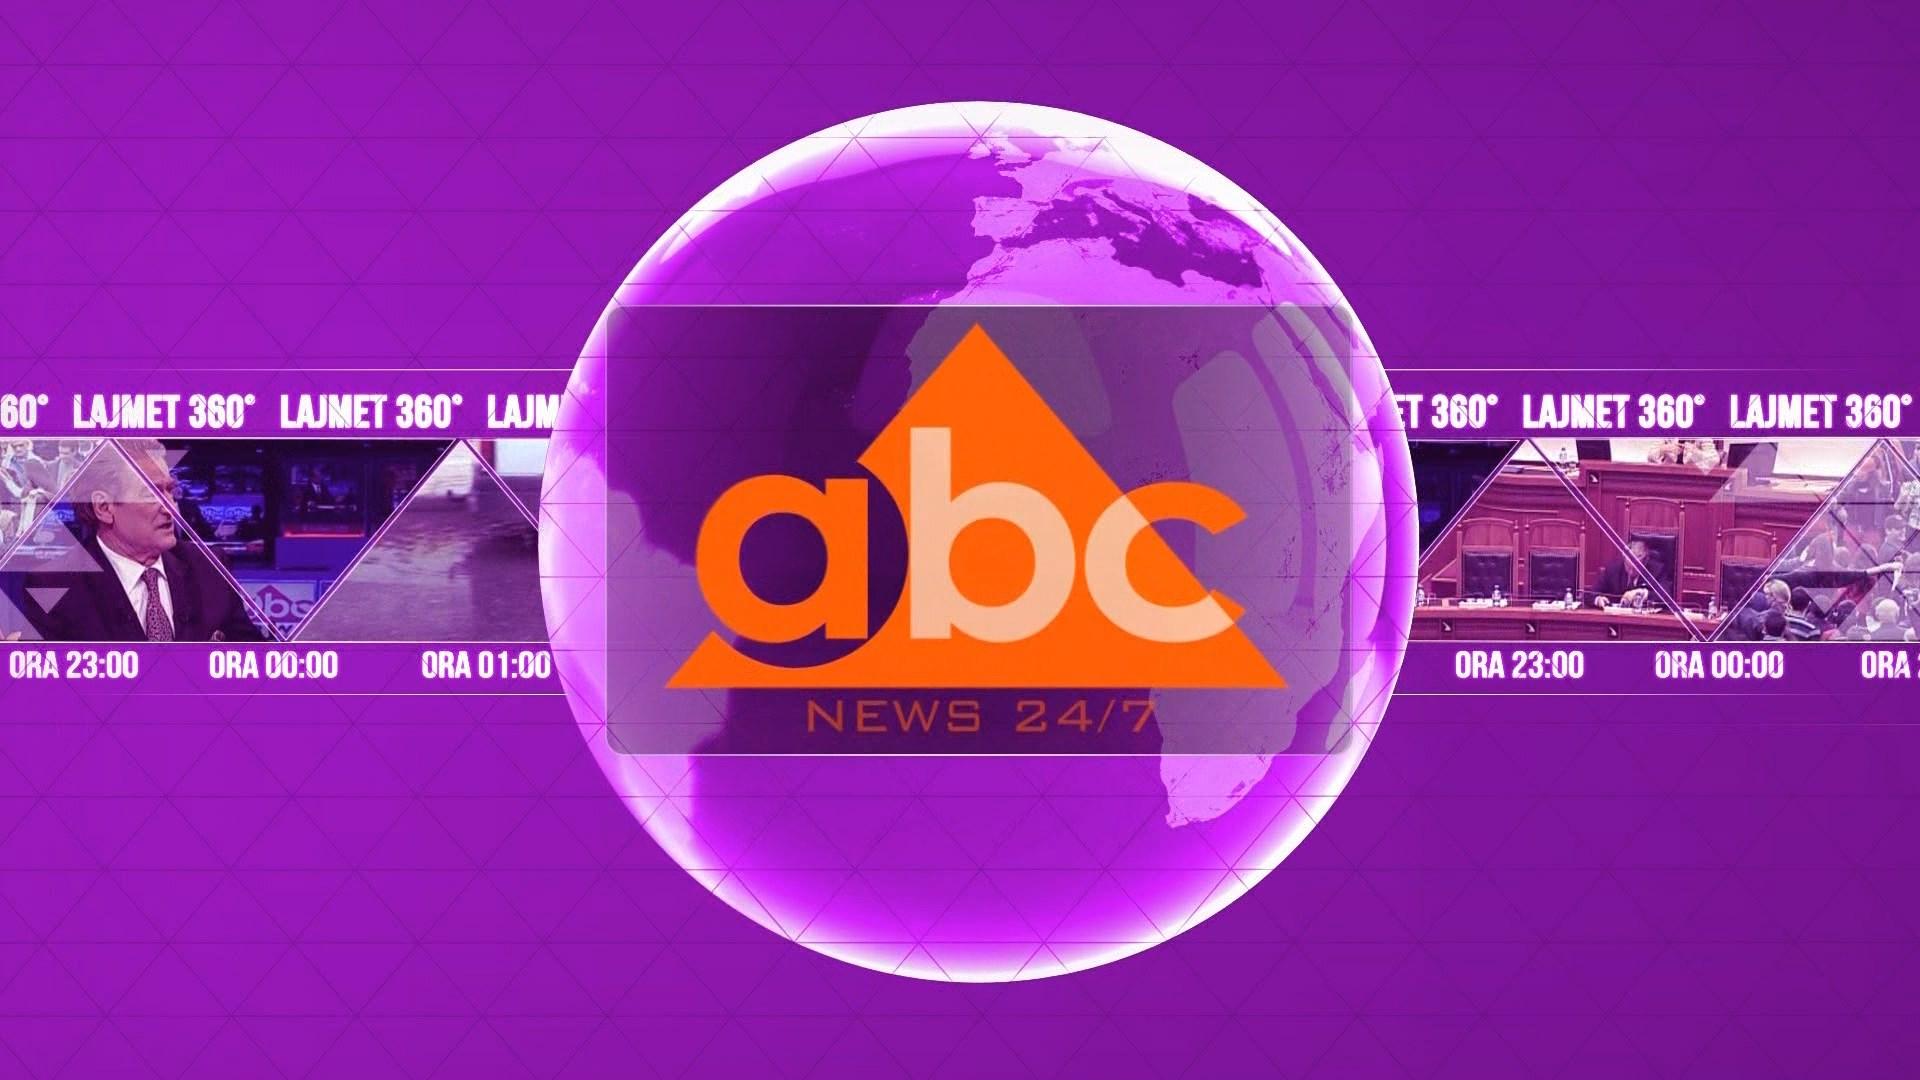 Edicioni i lajmeve ABC News ora 23:00, 25 Janar 2019